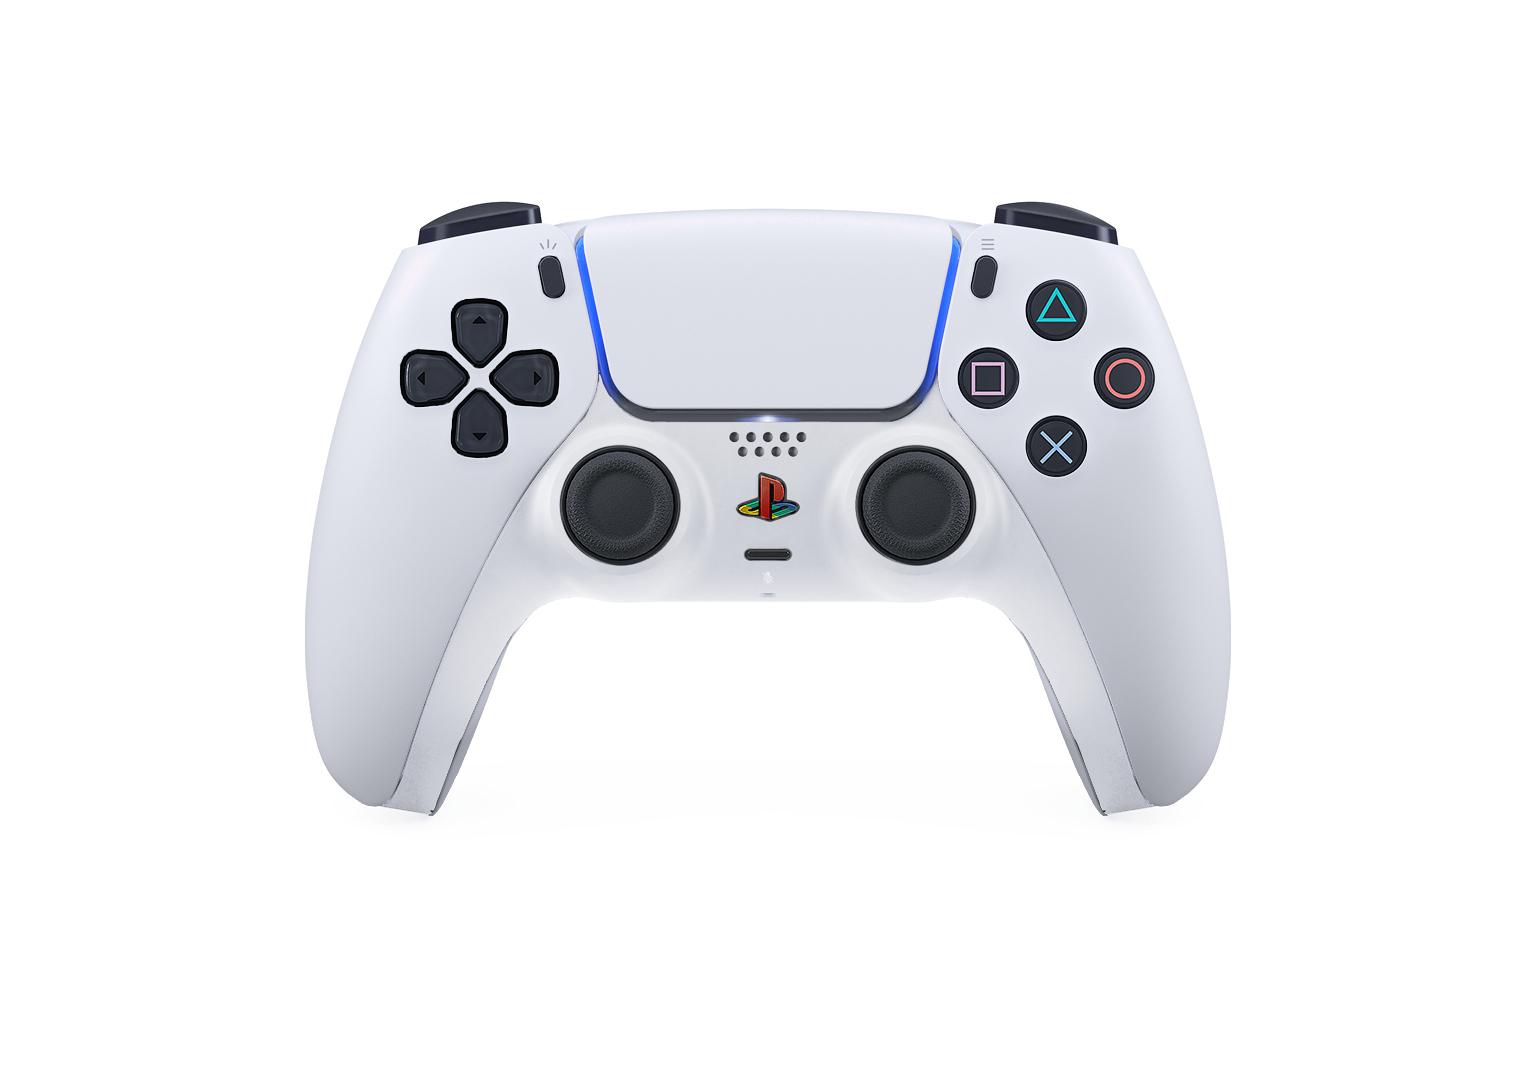 Ps5 VS XboxOne Series